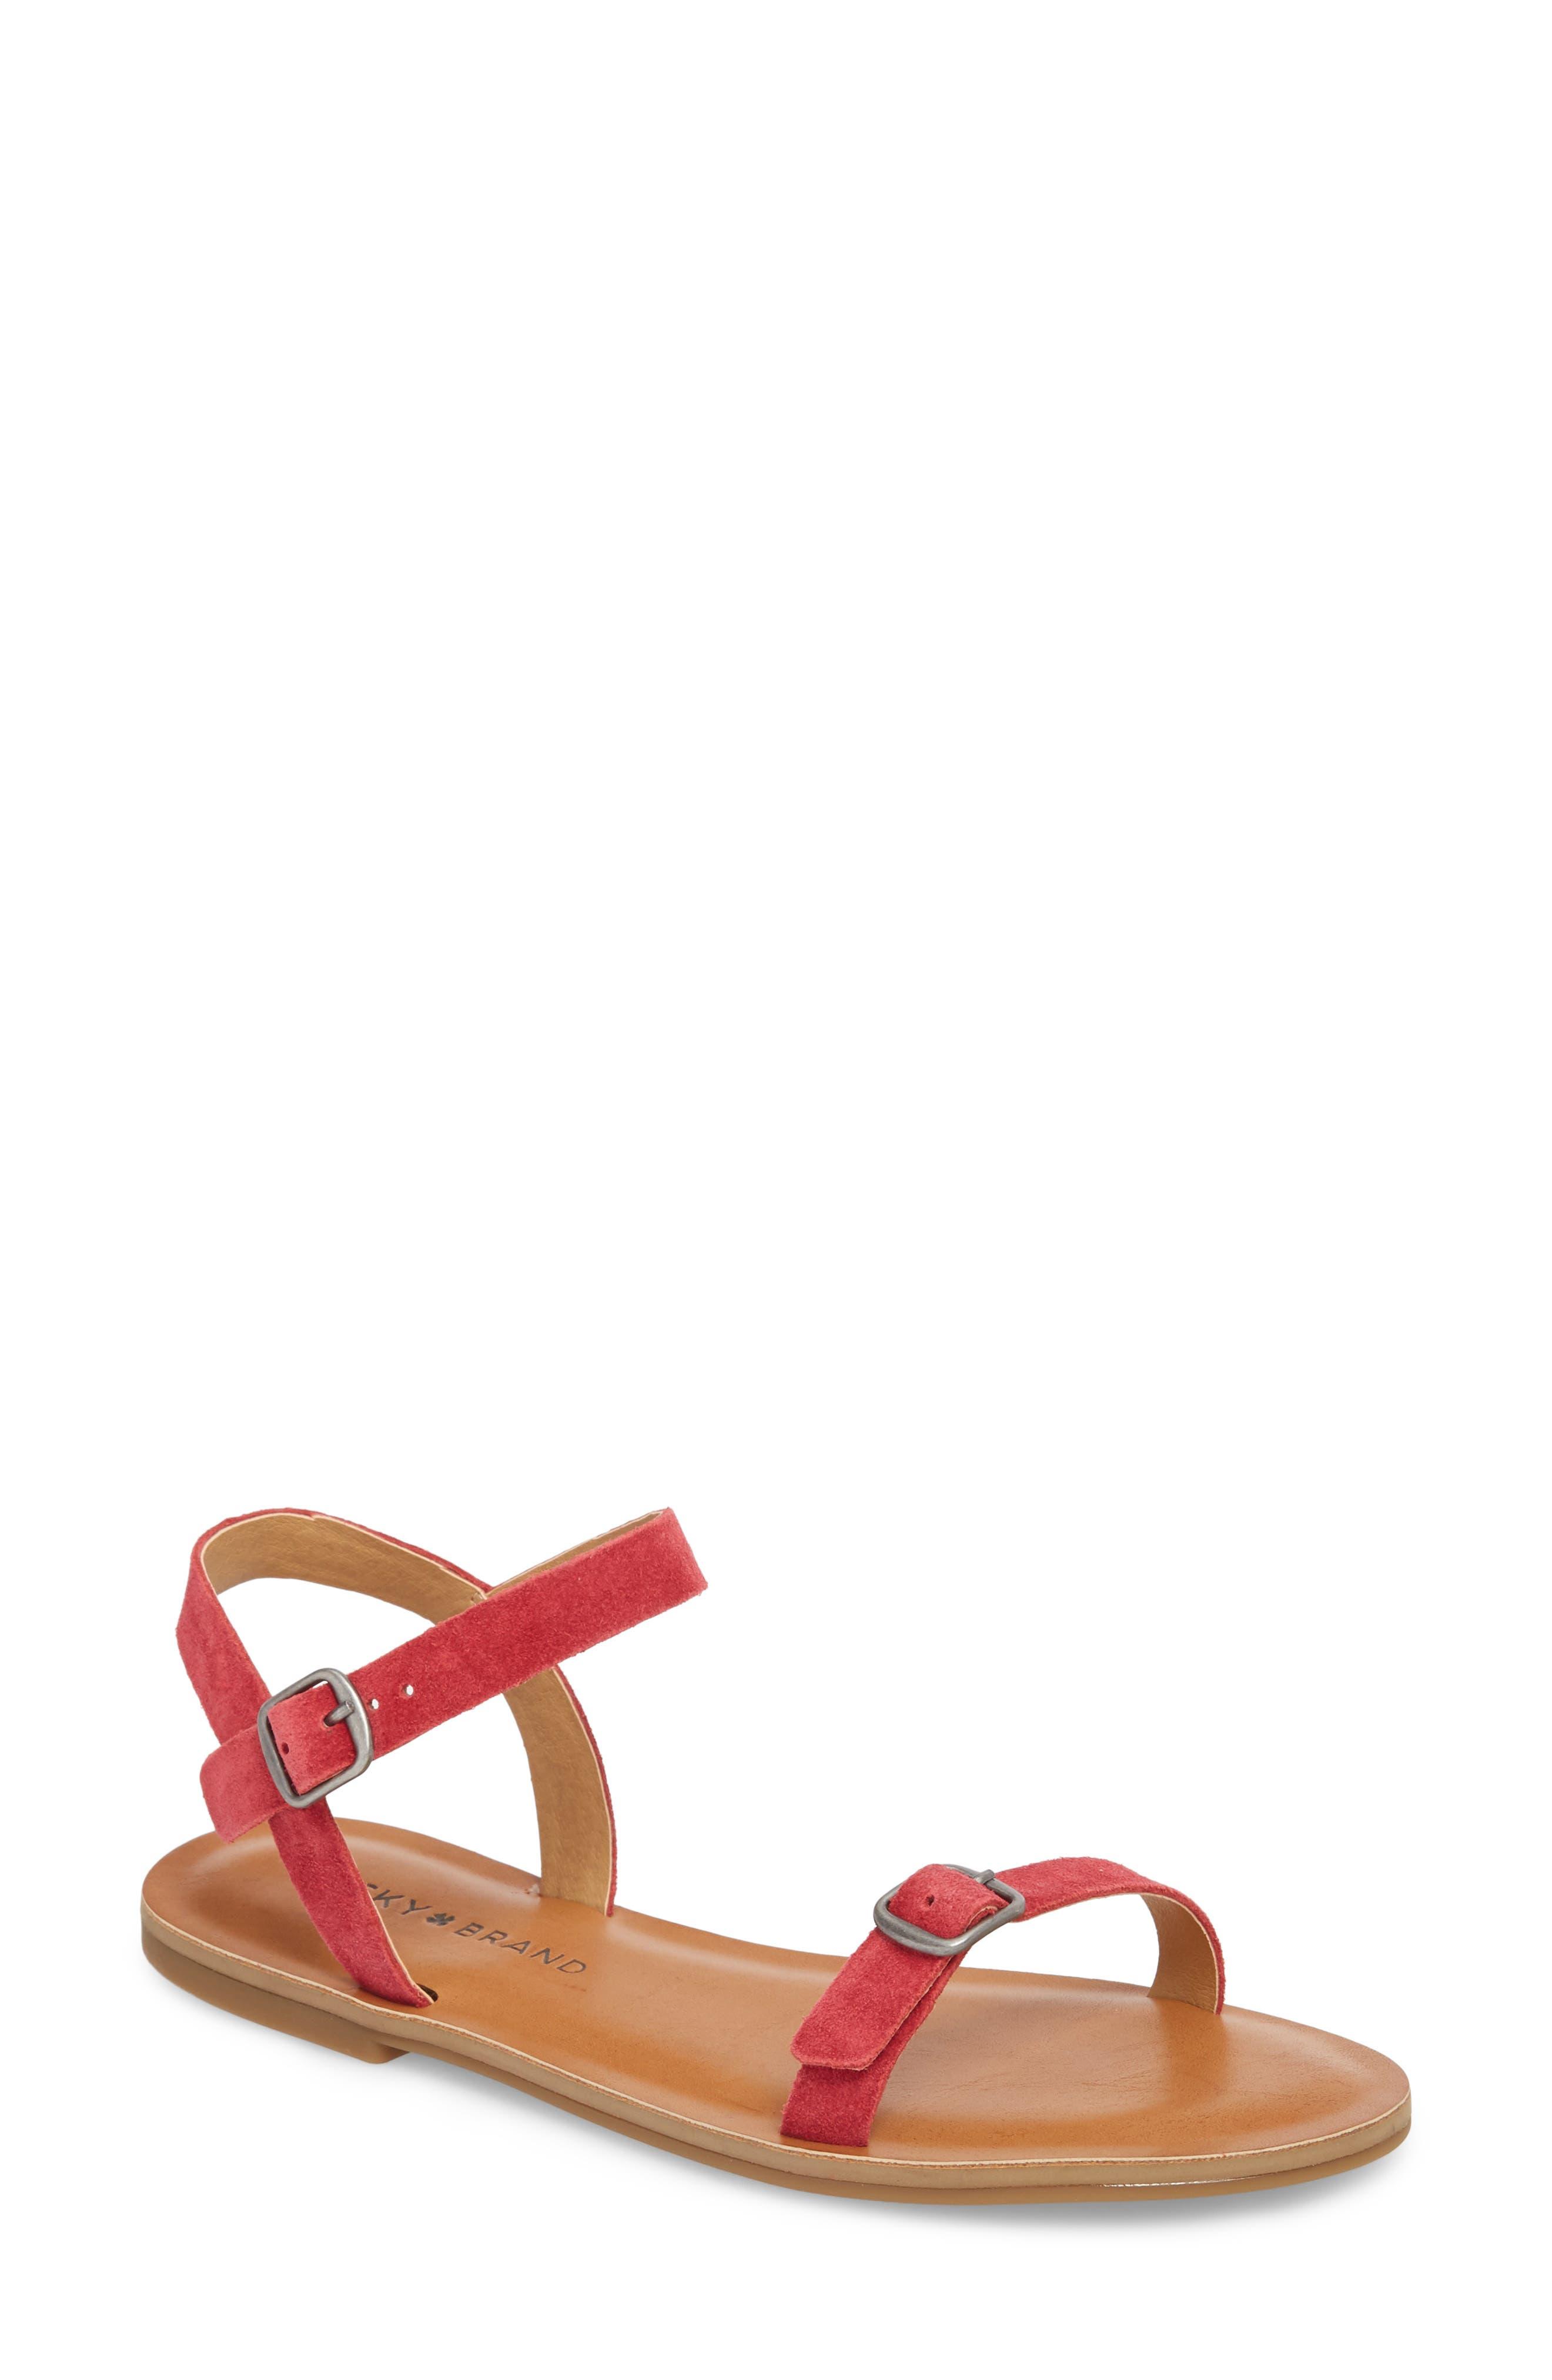 Adymaris Sandal,                         Main,                         color, Sb Red Suede